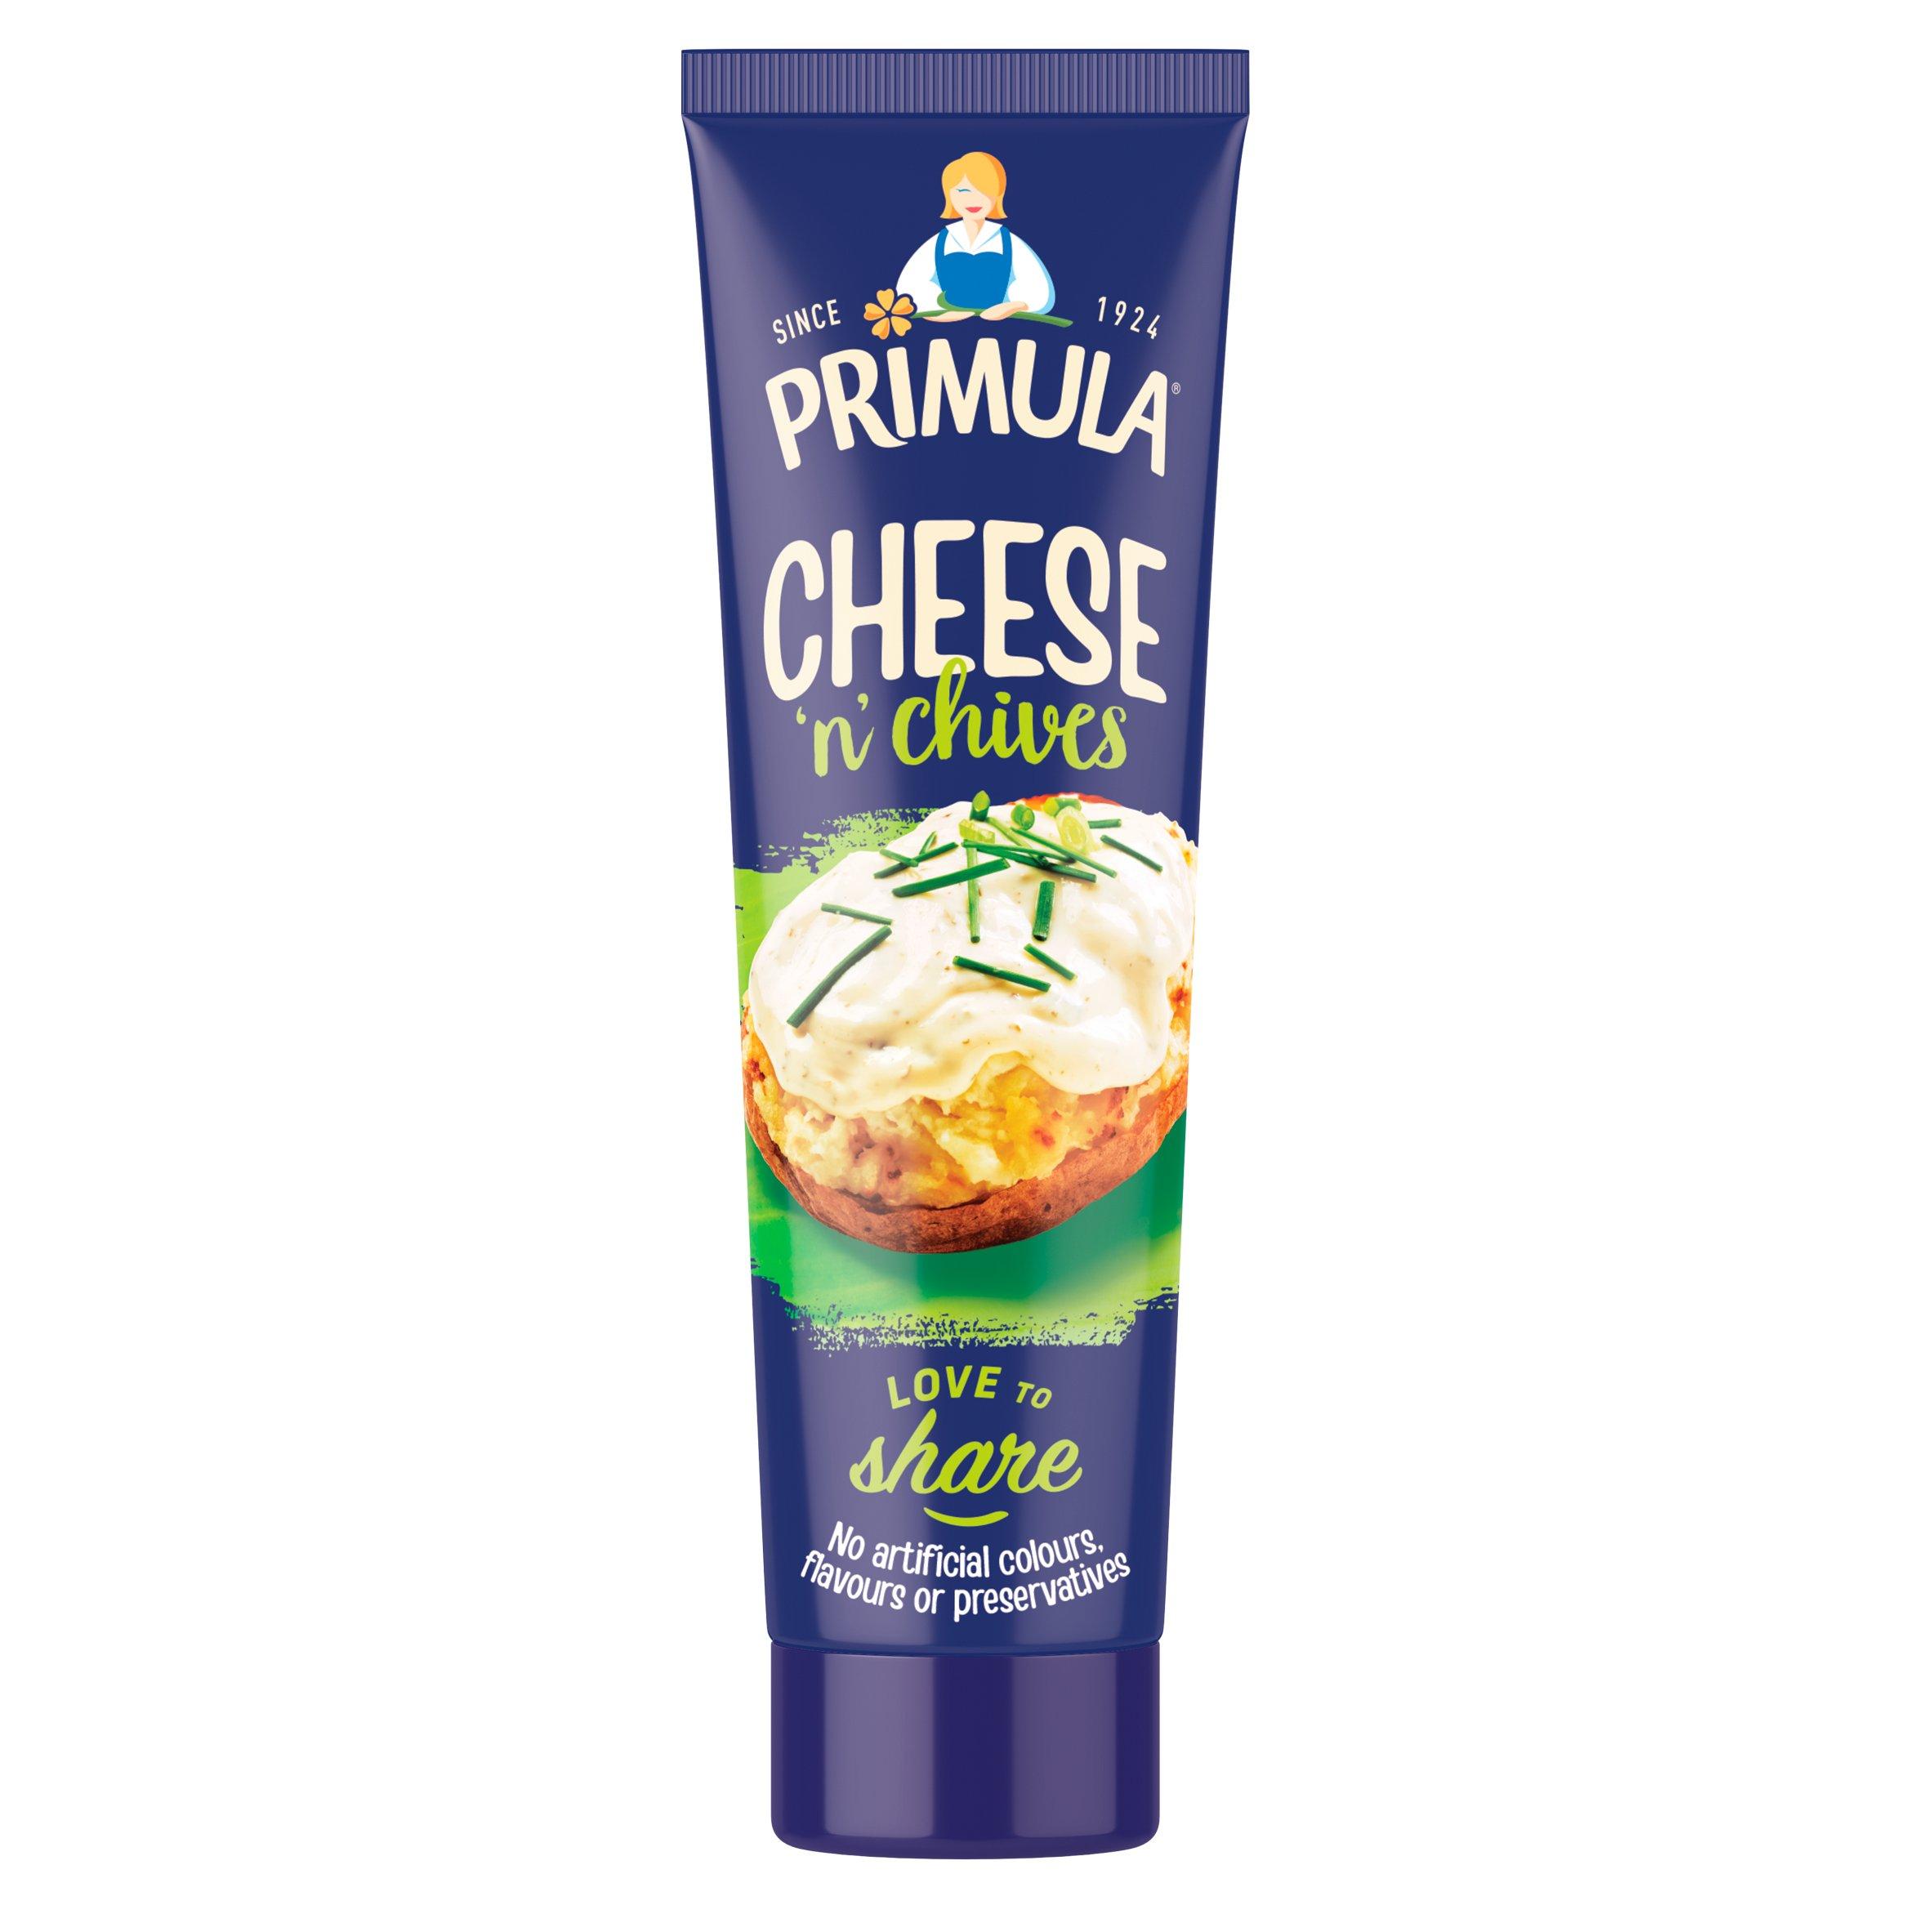 Primula Cheese Spread Plus Chives 150G Tube